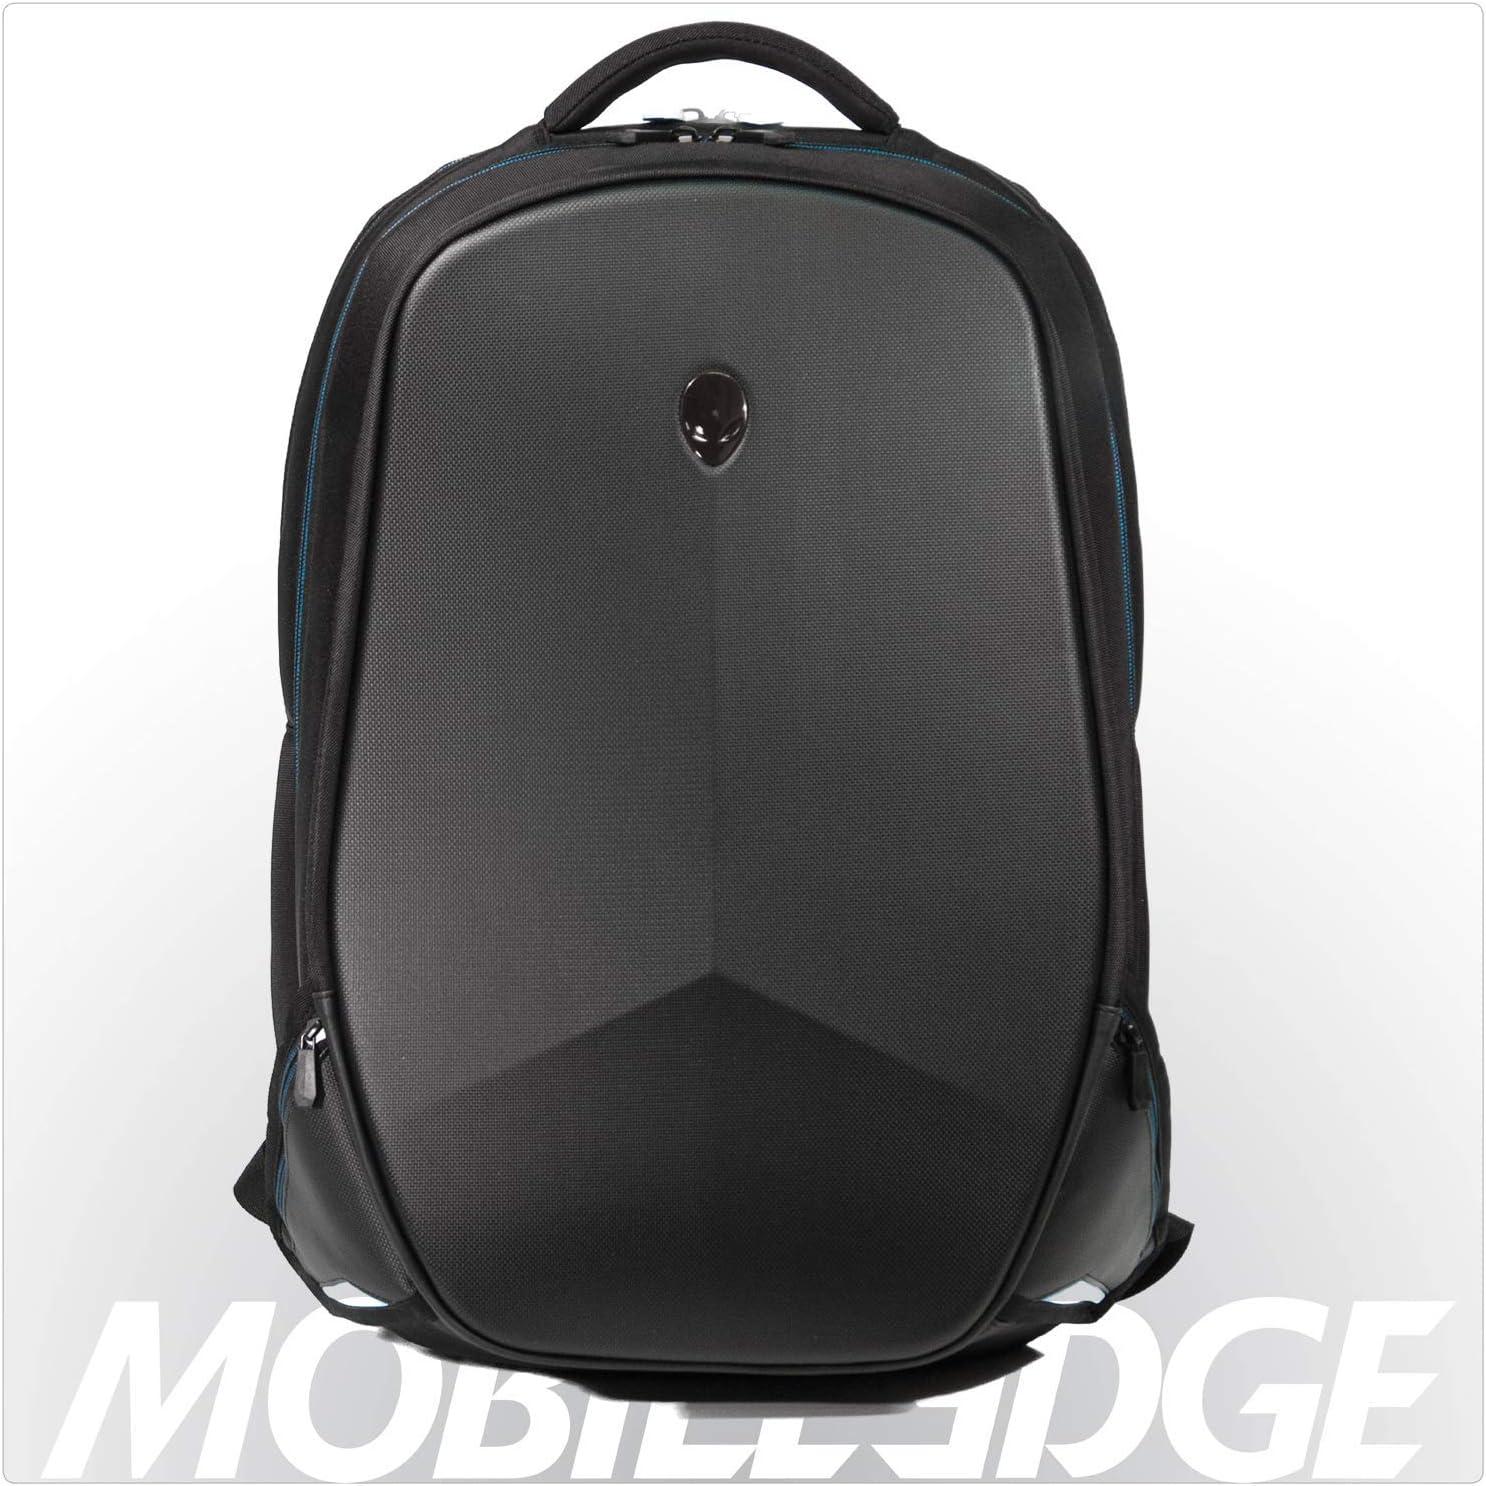 Alienware Vindicator 2.0 Gaming Laptop Backpack, 13-Inch, Black (AWV13BP2.0)